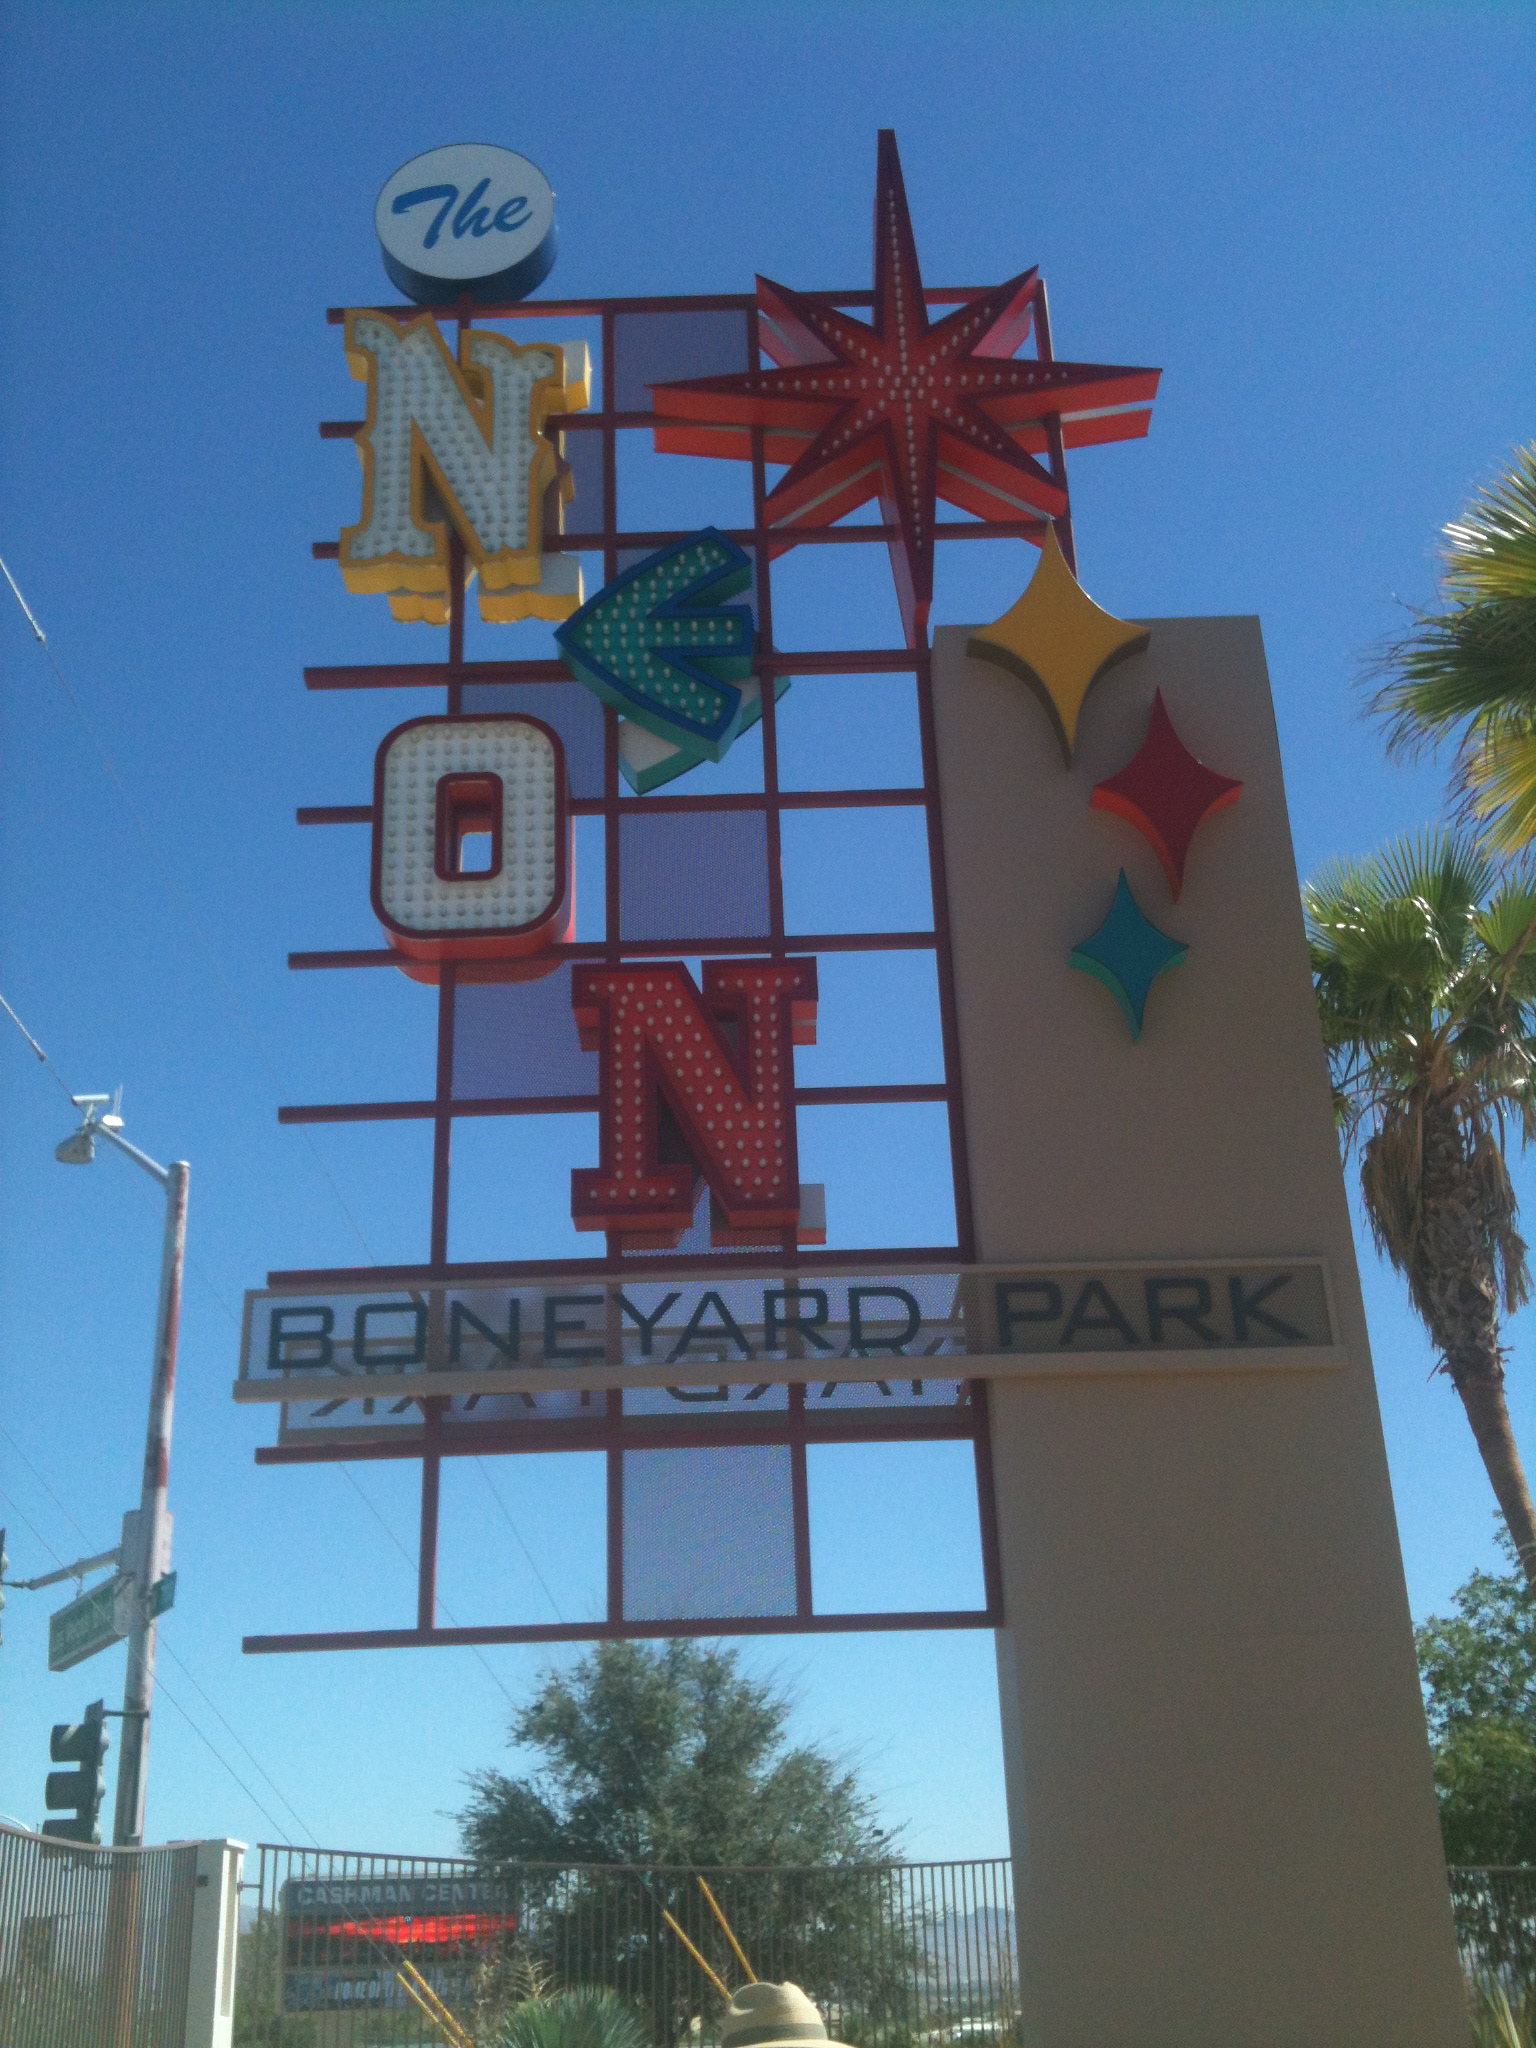 The Neon Bonyard